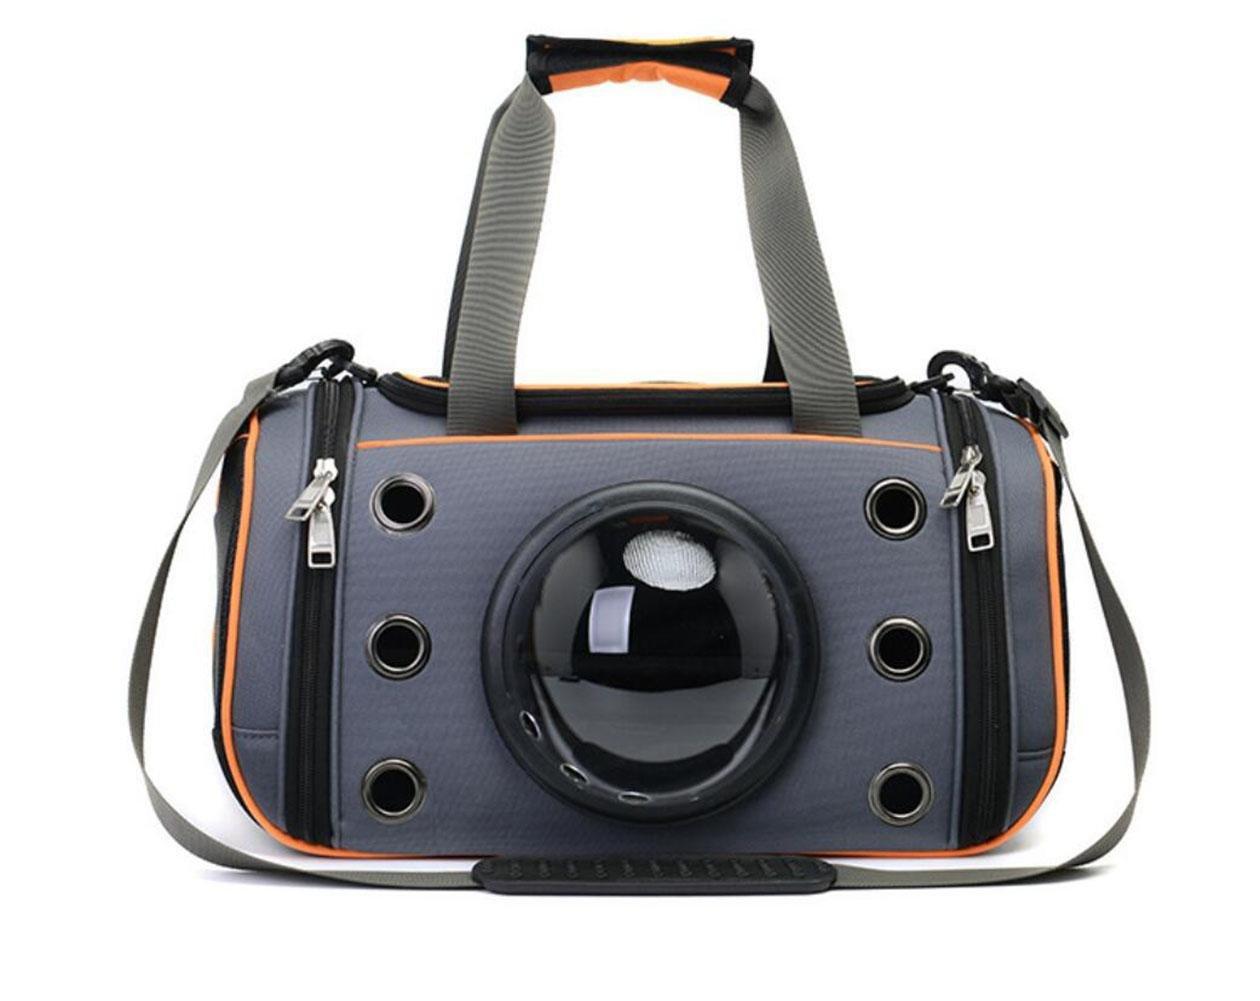 LVRXJP Pet Travel Bag Space Pet Case Innovative Capsual Traveler Bubble Outdoor Shoulder Bags Pet Carriers, S